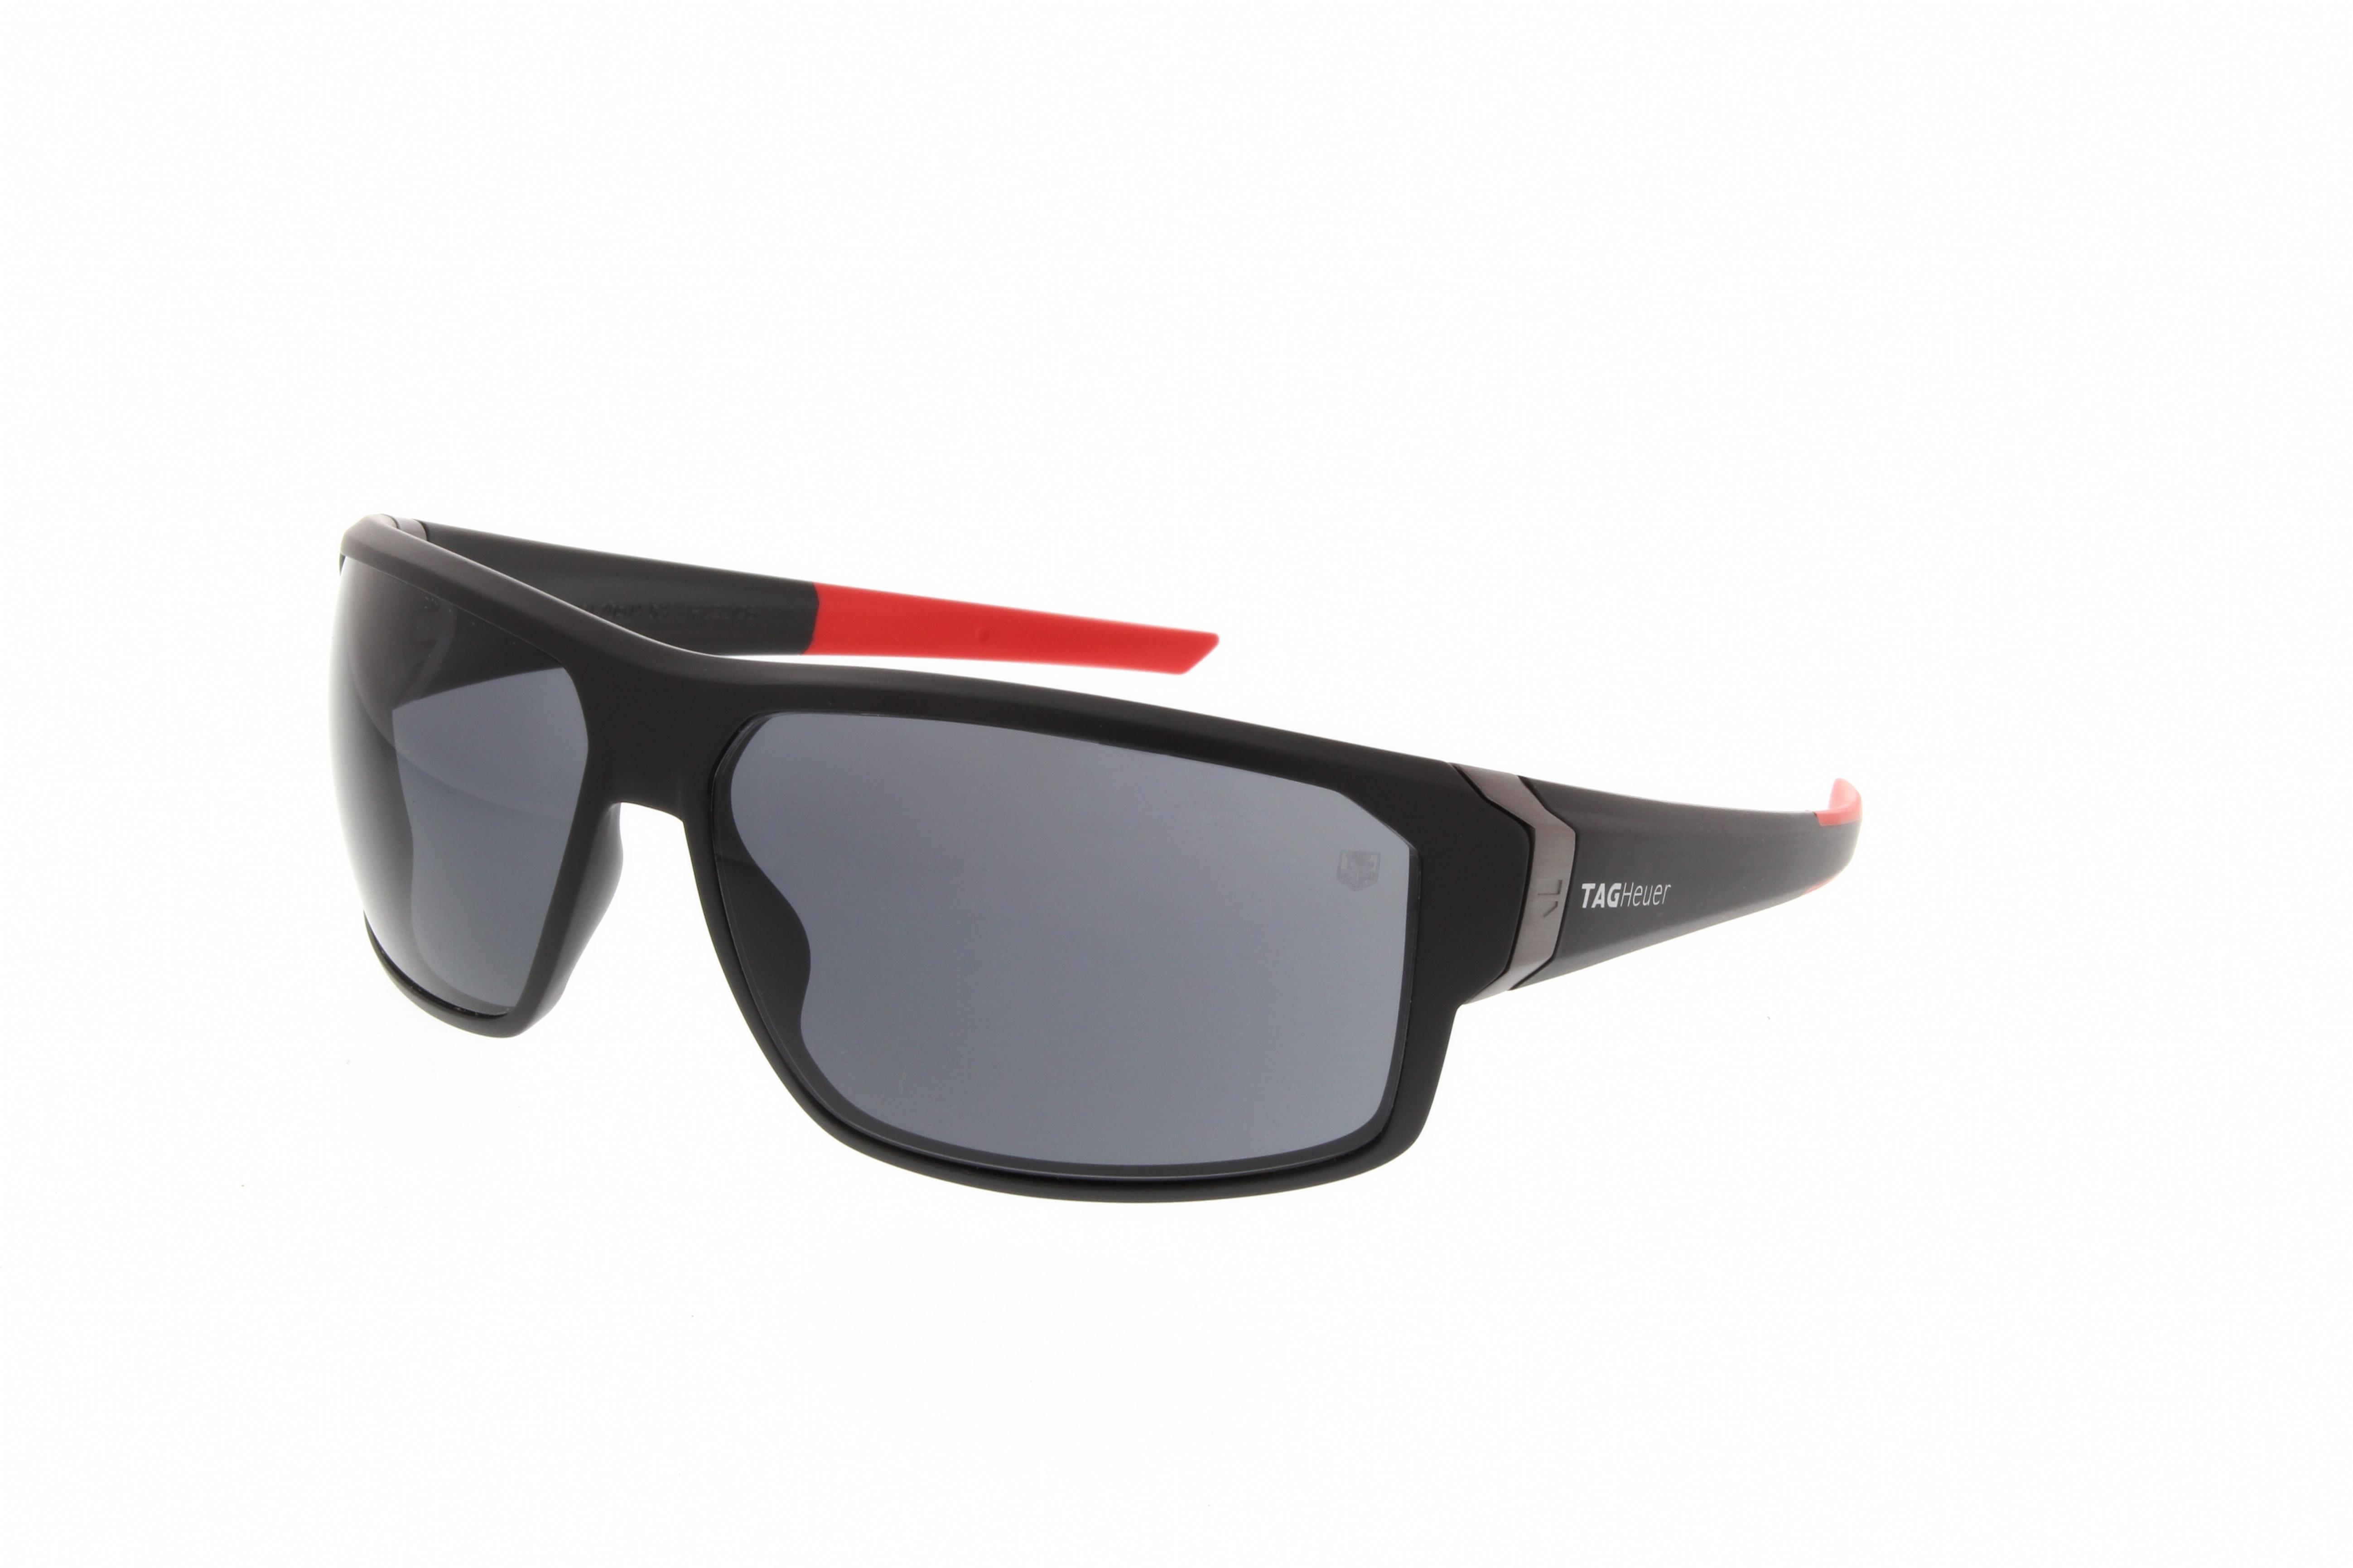 1f7d558f8f Tag Heuer 9223 Racer 2 Sunglasses